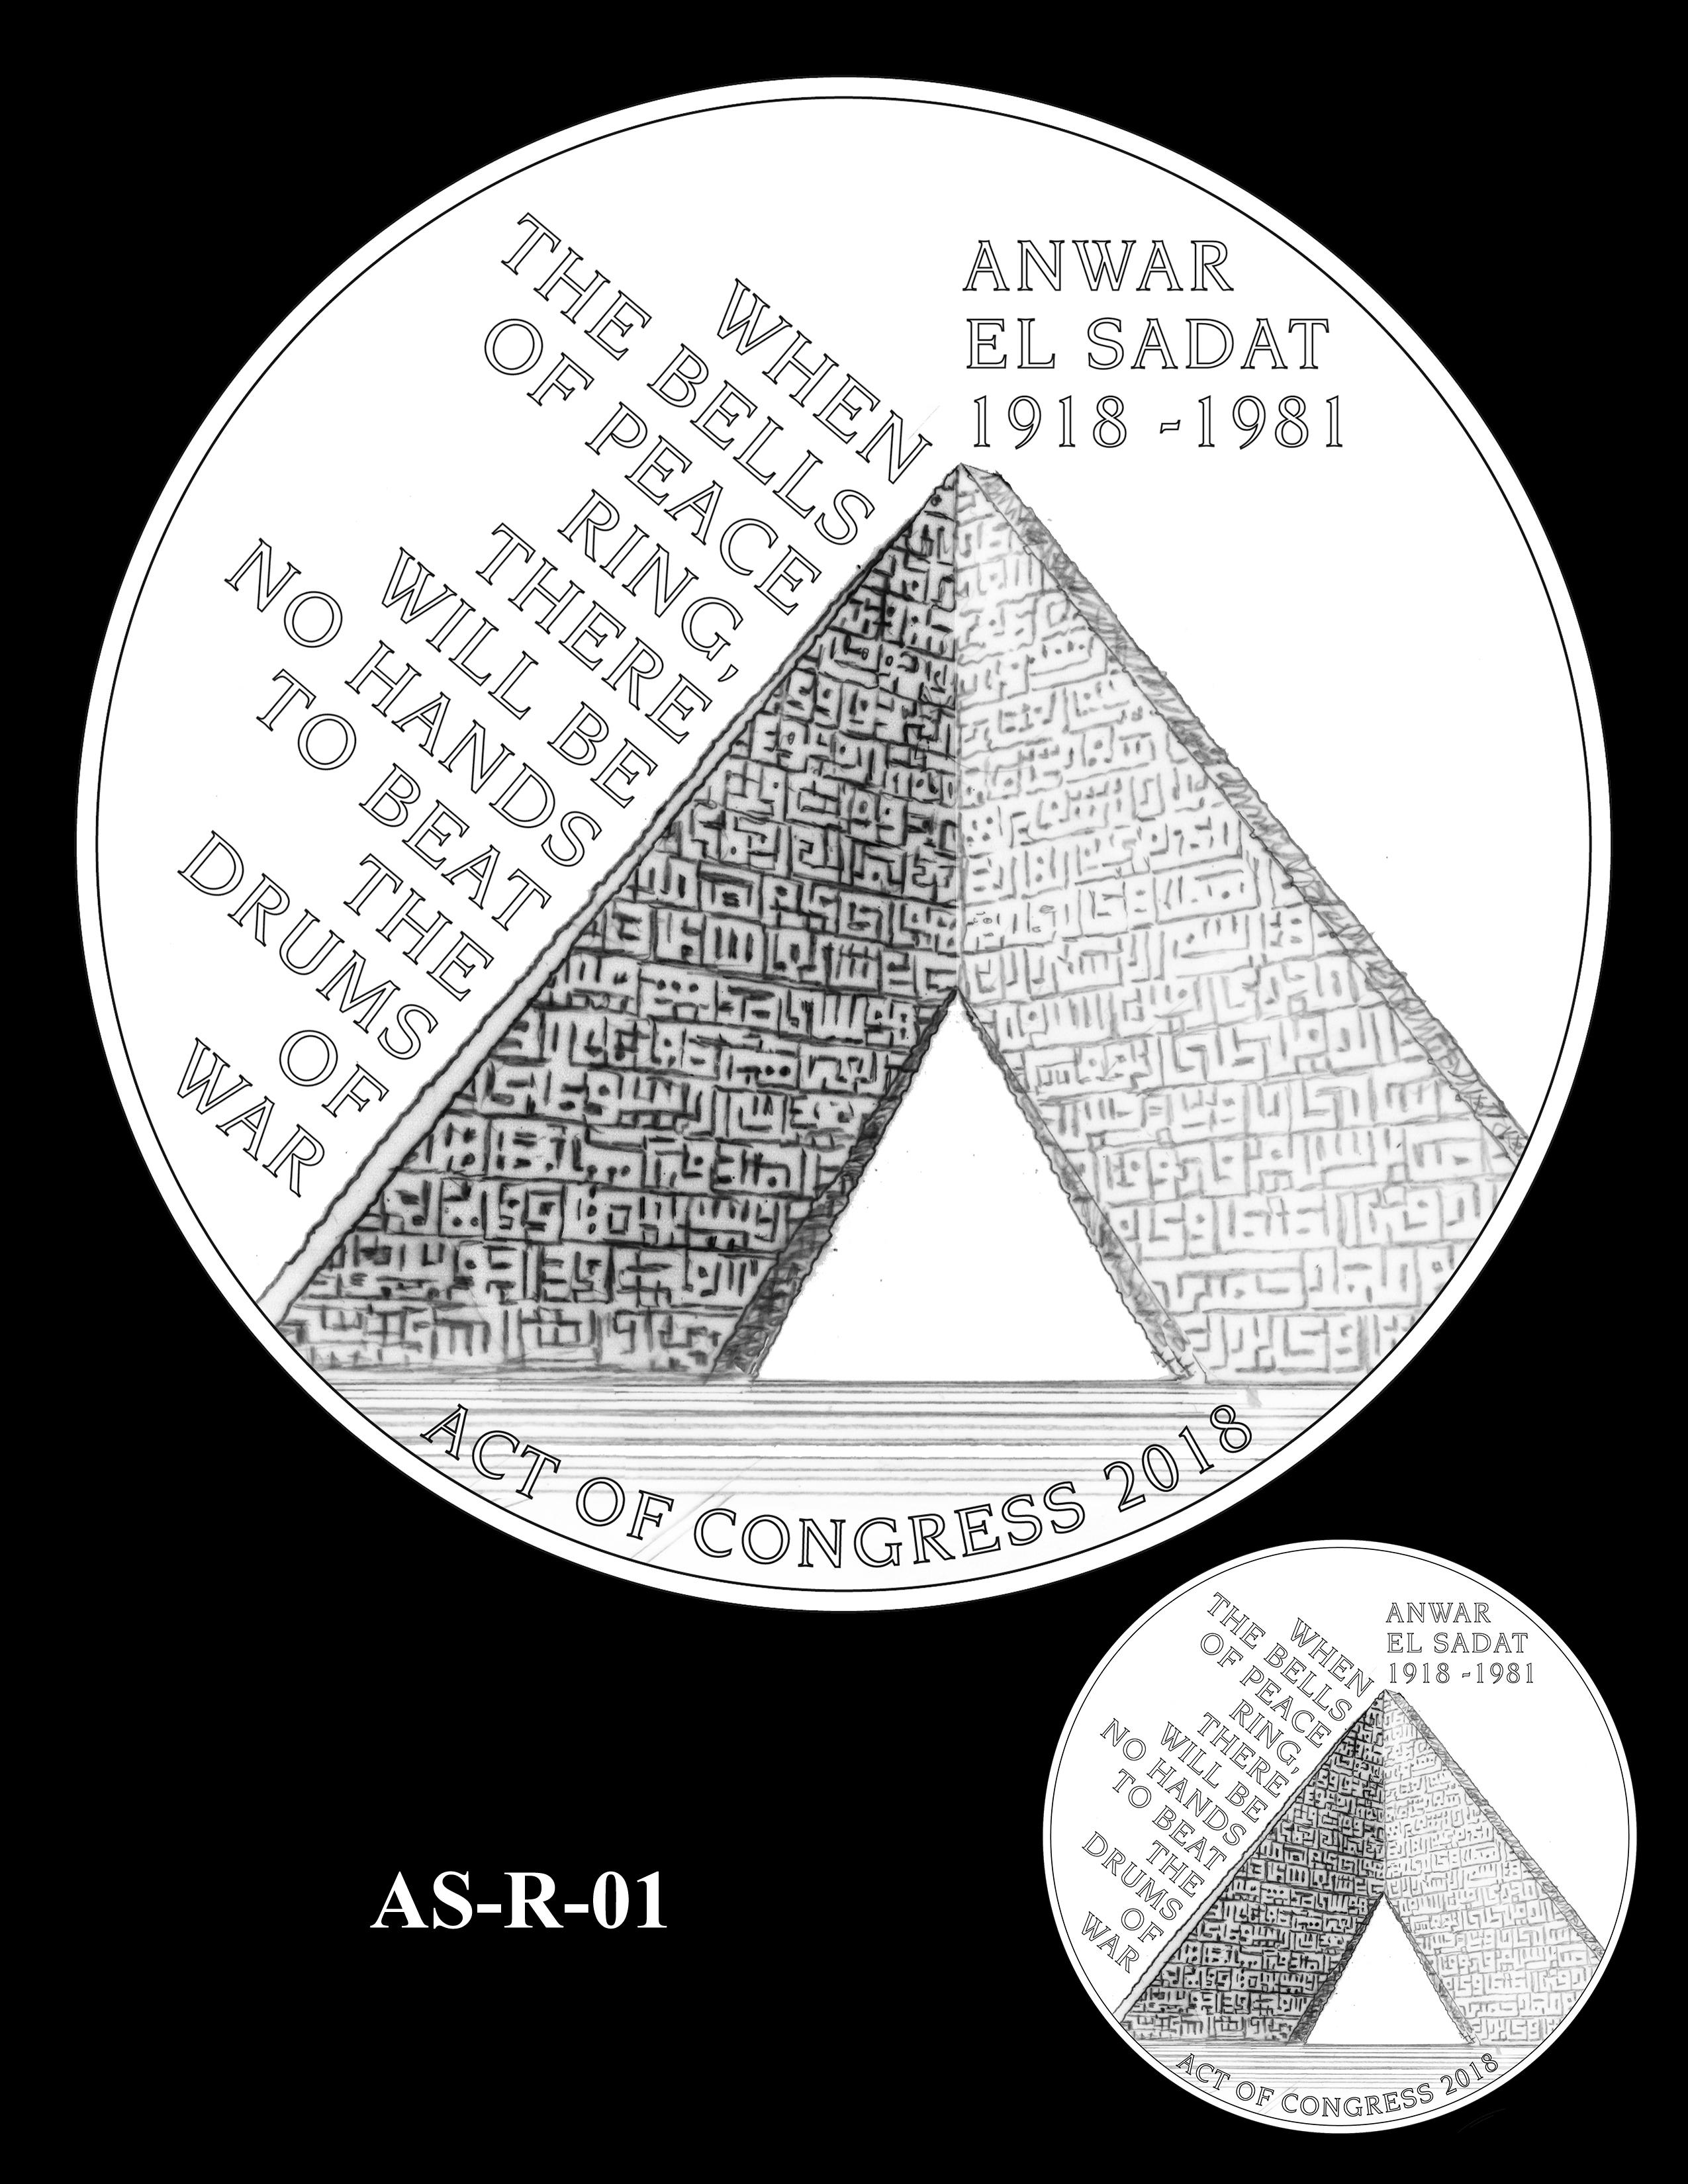 AS-R-01 -- Anwar El Sadat CGM Reverse